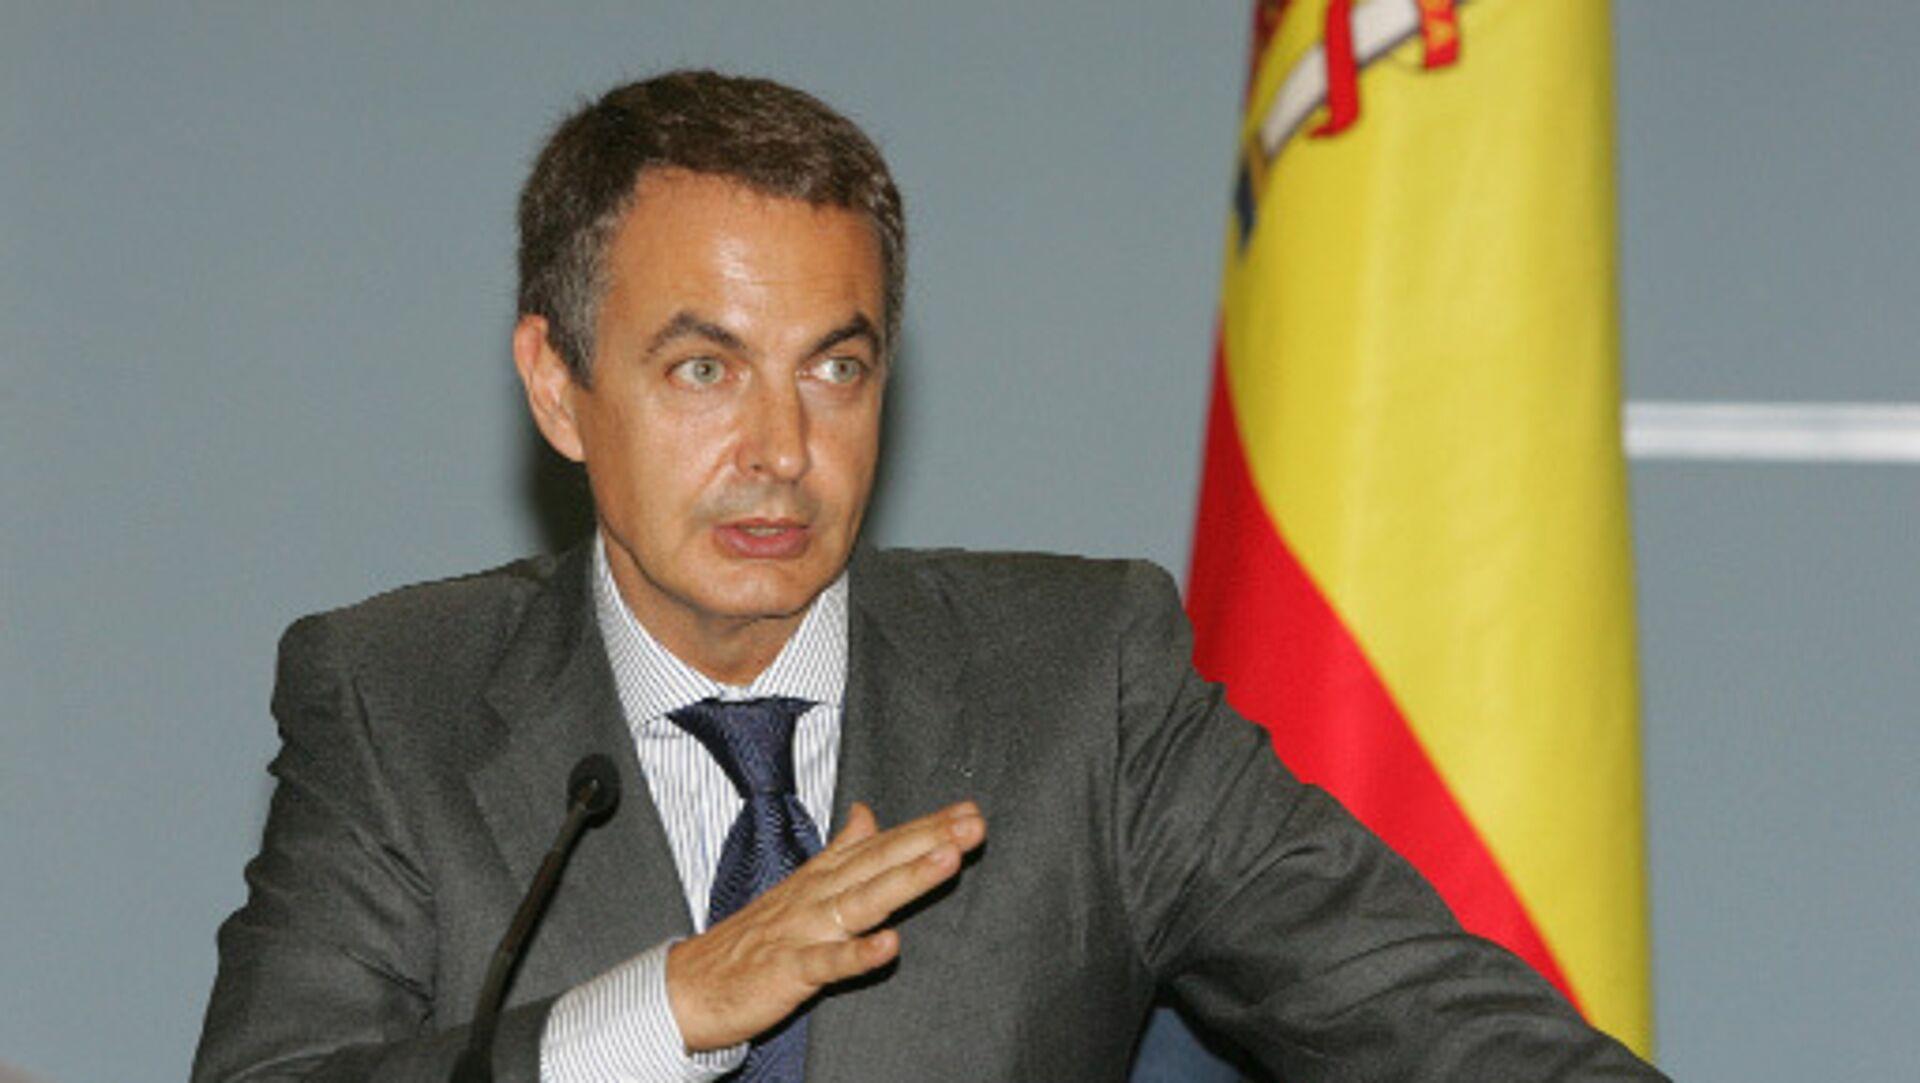 Председатель правительства Испании Хосе Луис Родригес Сапатеро. Архив - Sputnik Mundo, 1920, 28.04.2021